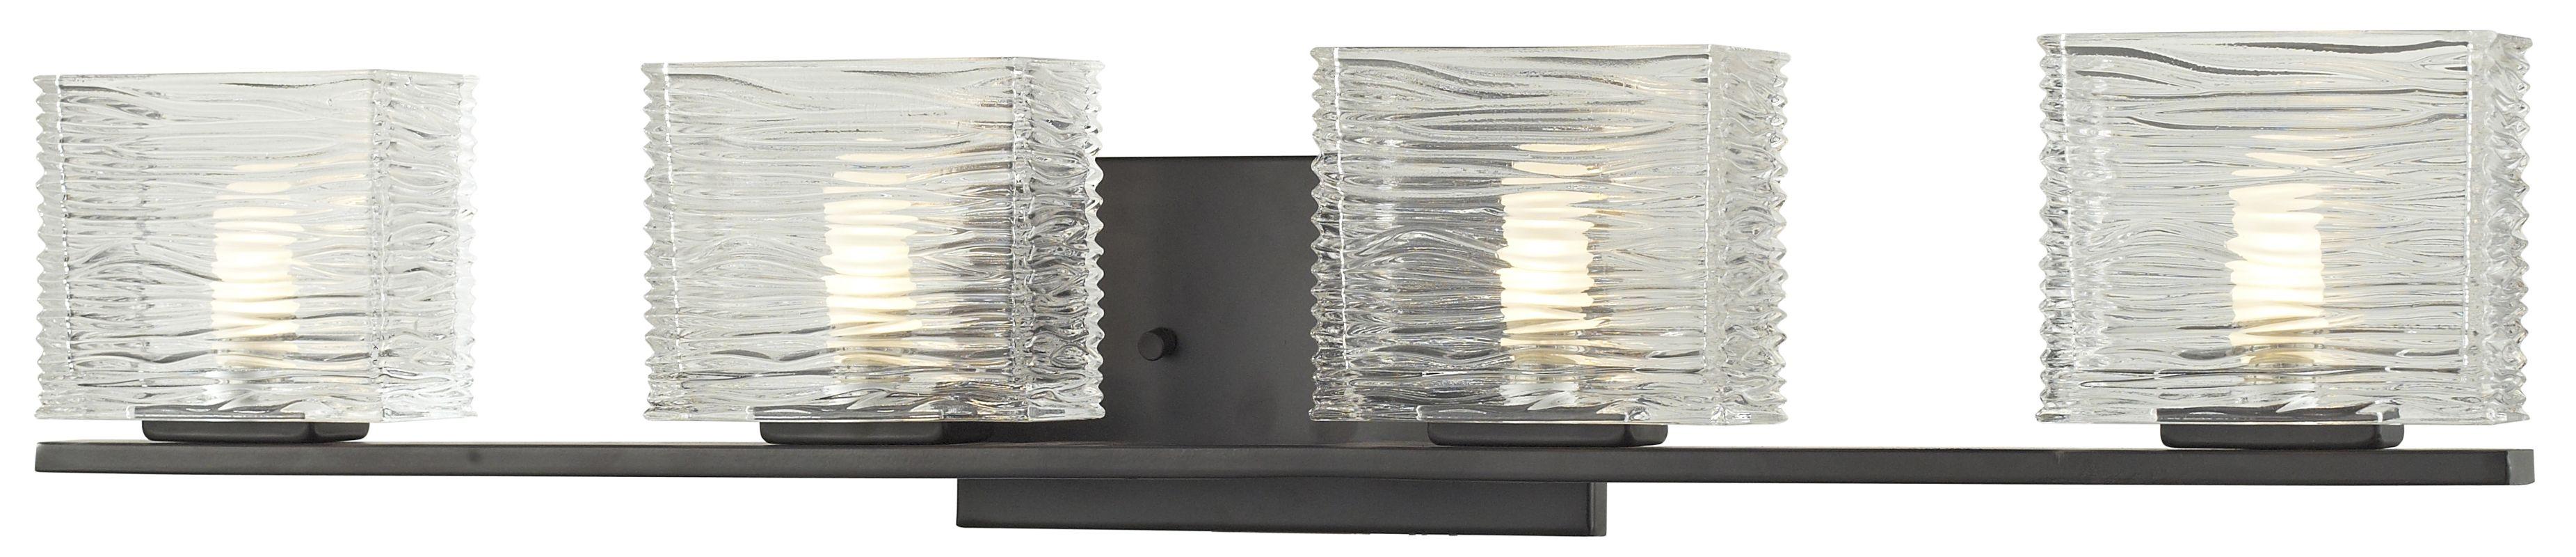 Z-Lite 3026-4V Jaol 4 Light ADA Compliant Bathroom Vanity Light with